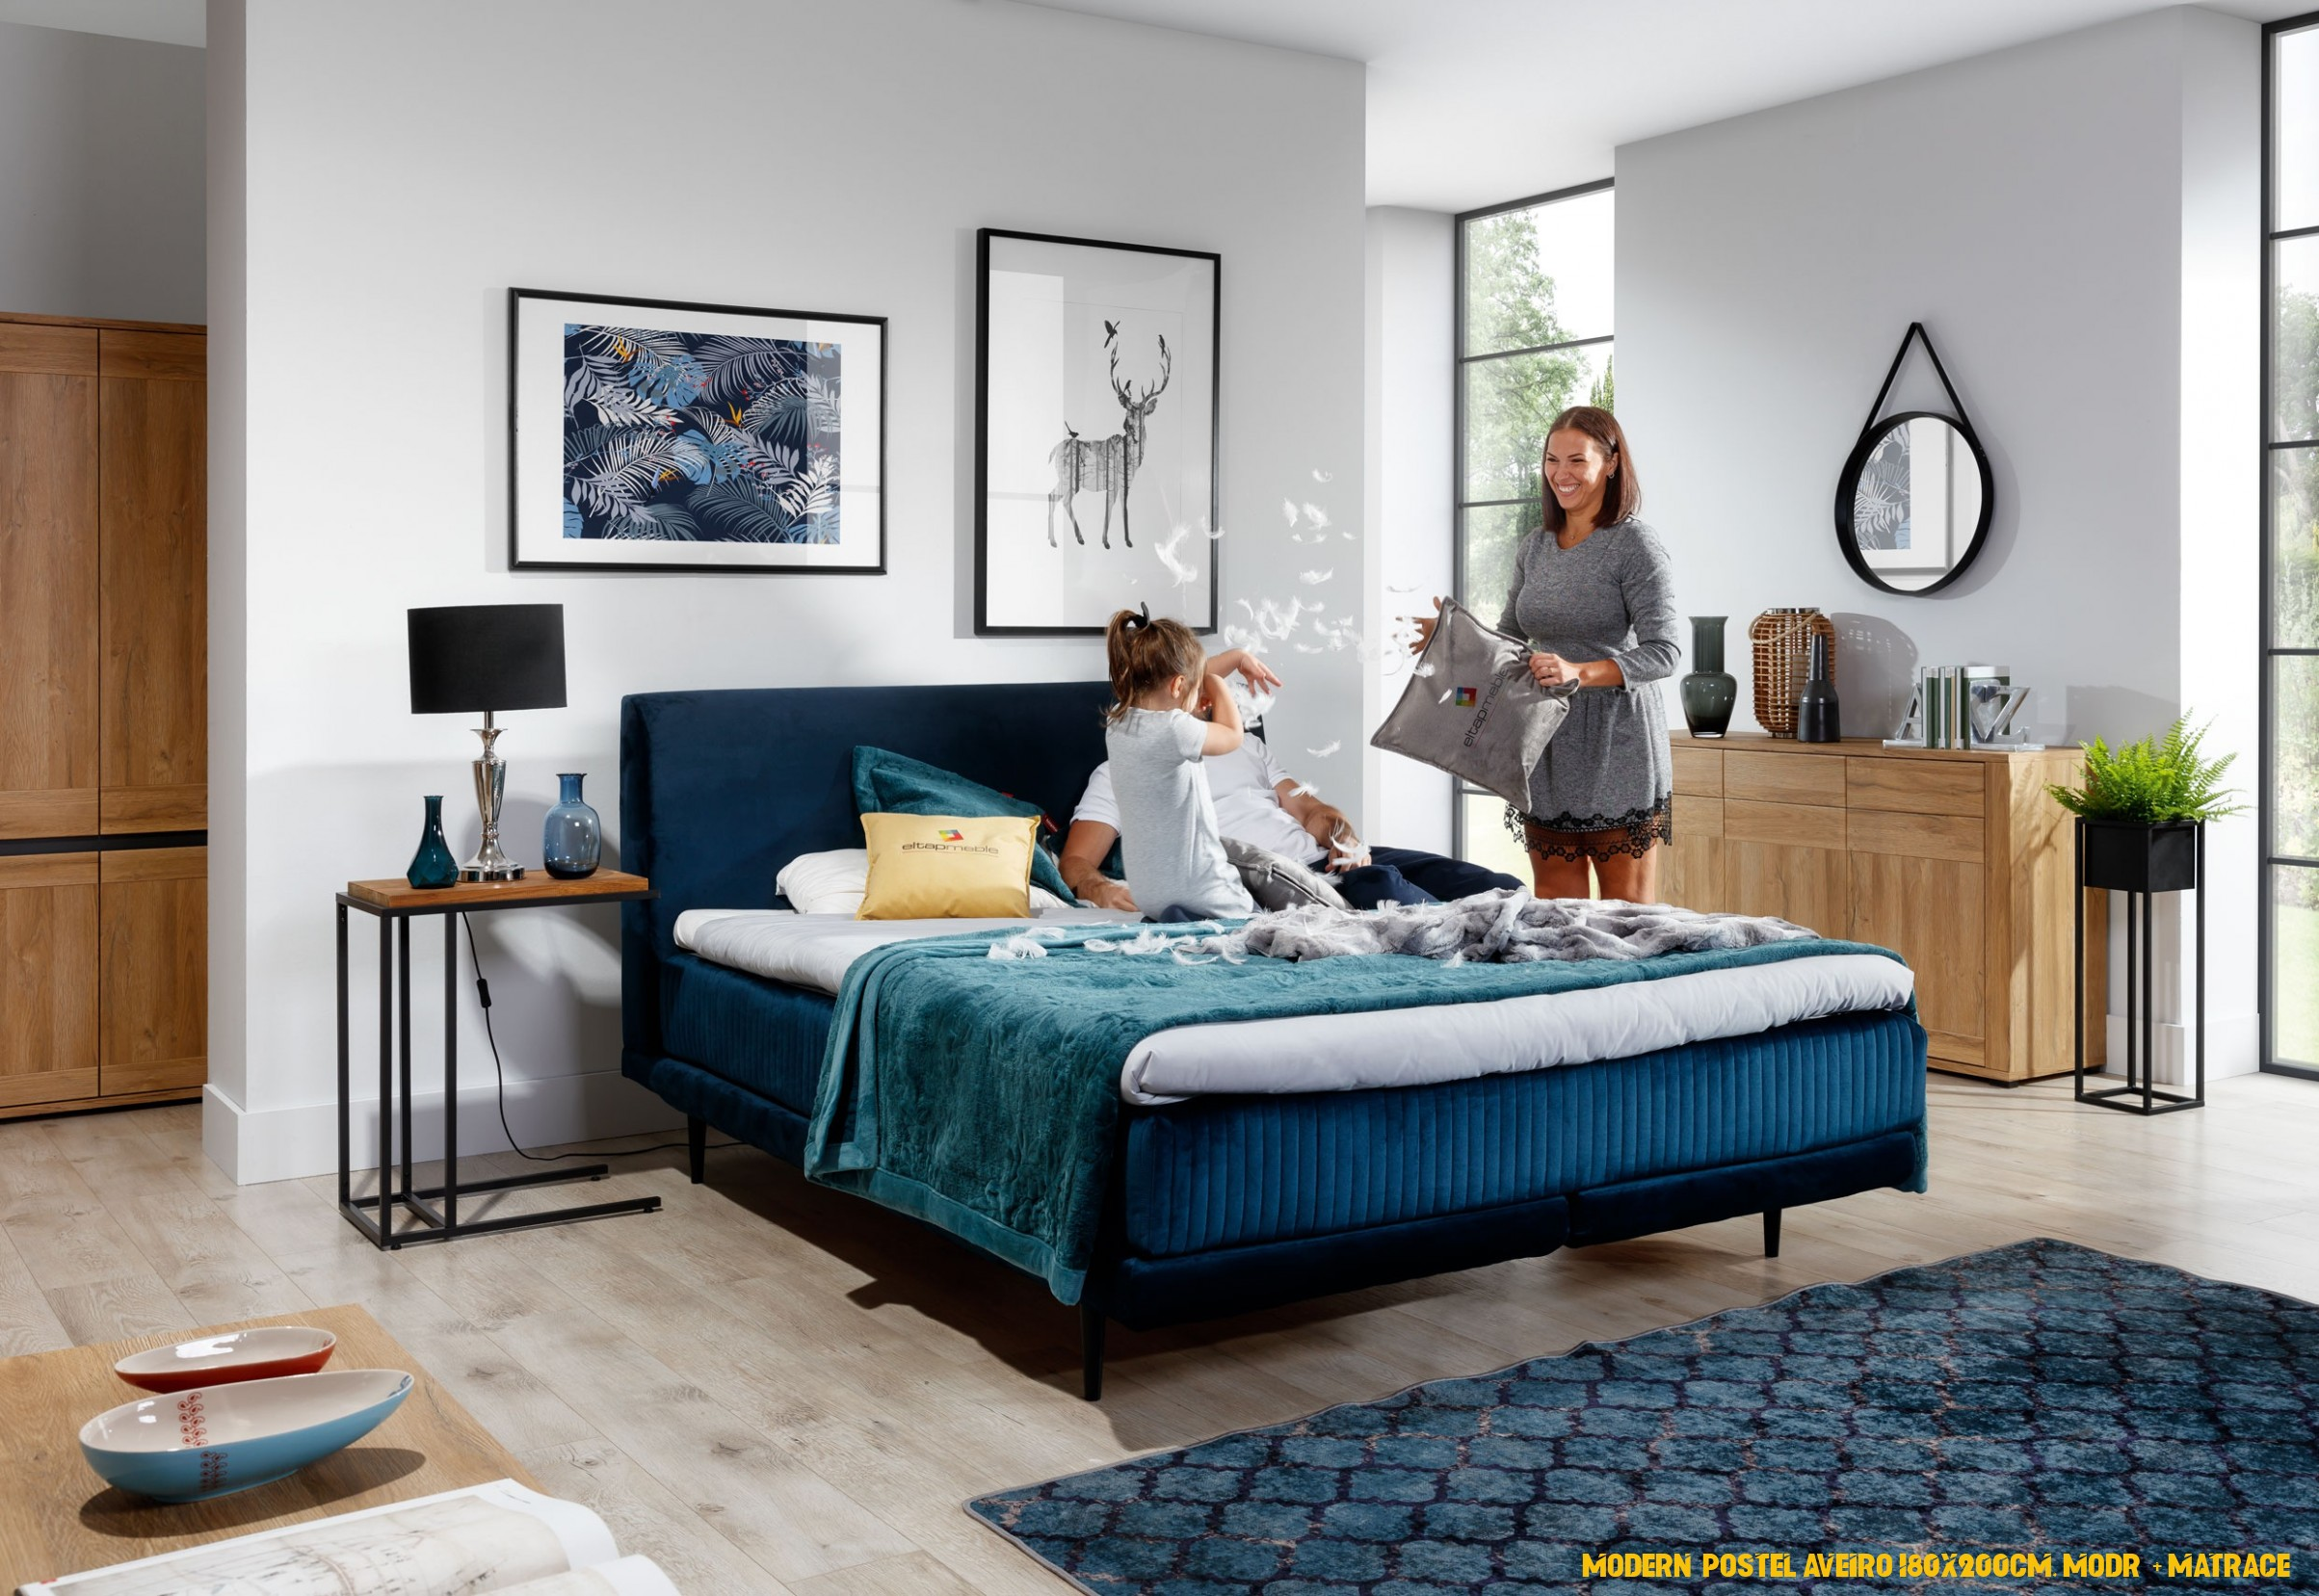 Moderní postel Aveiro 4x4cm, modrá + matrace